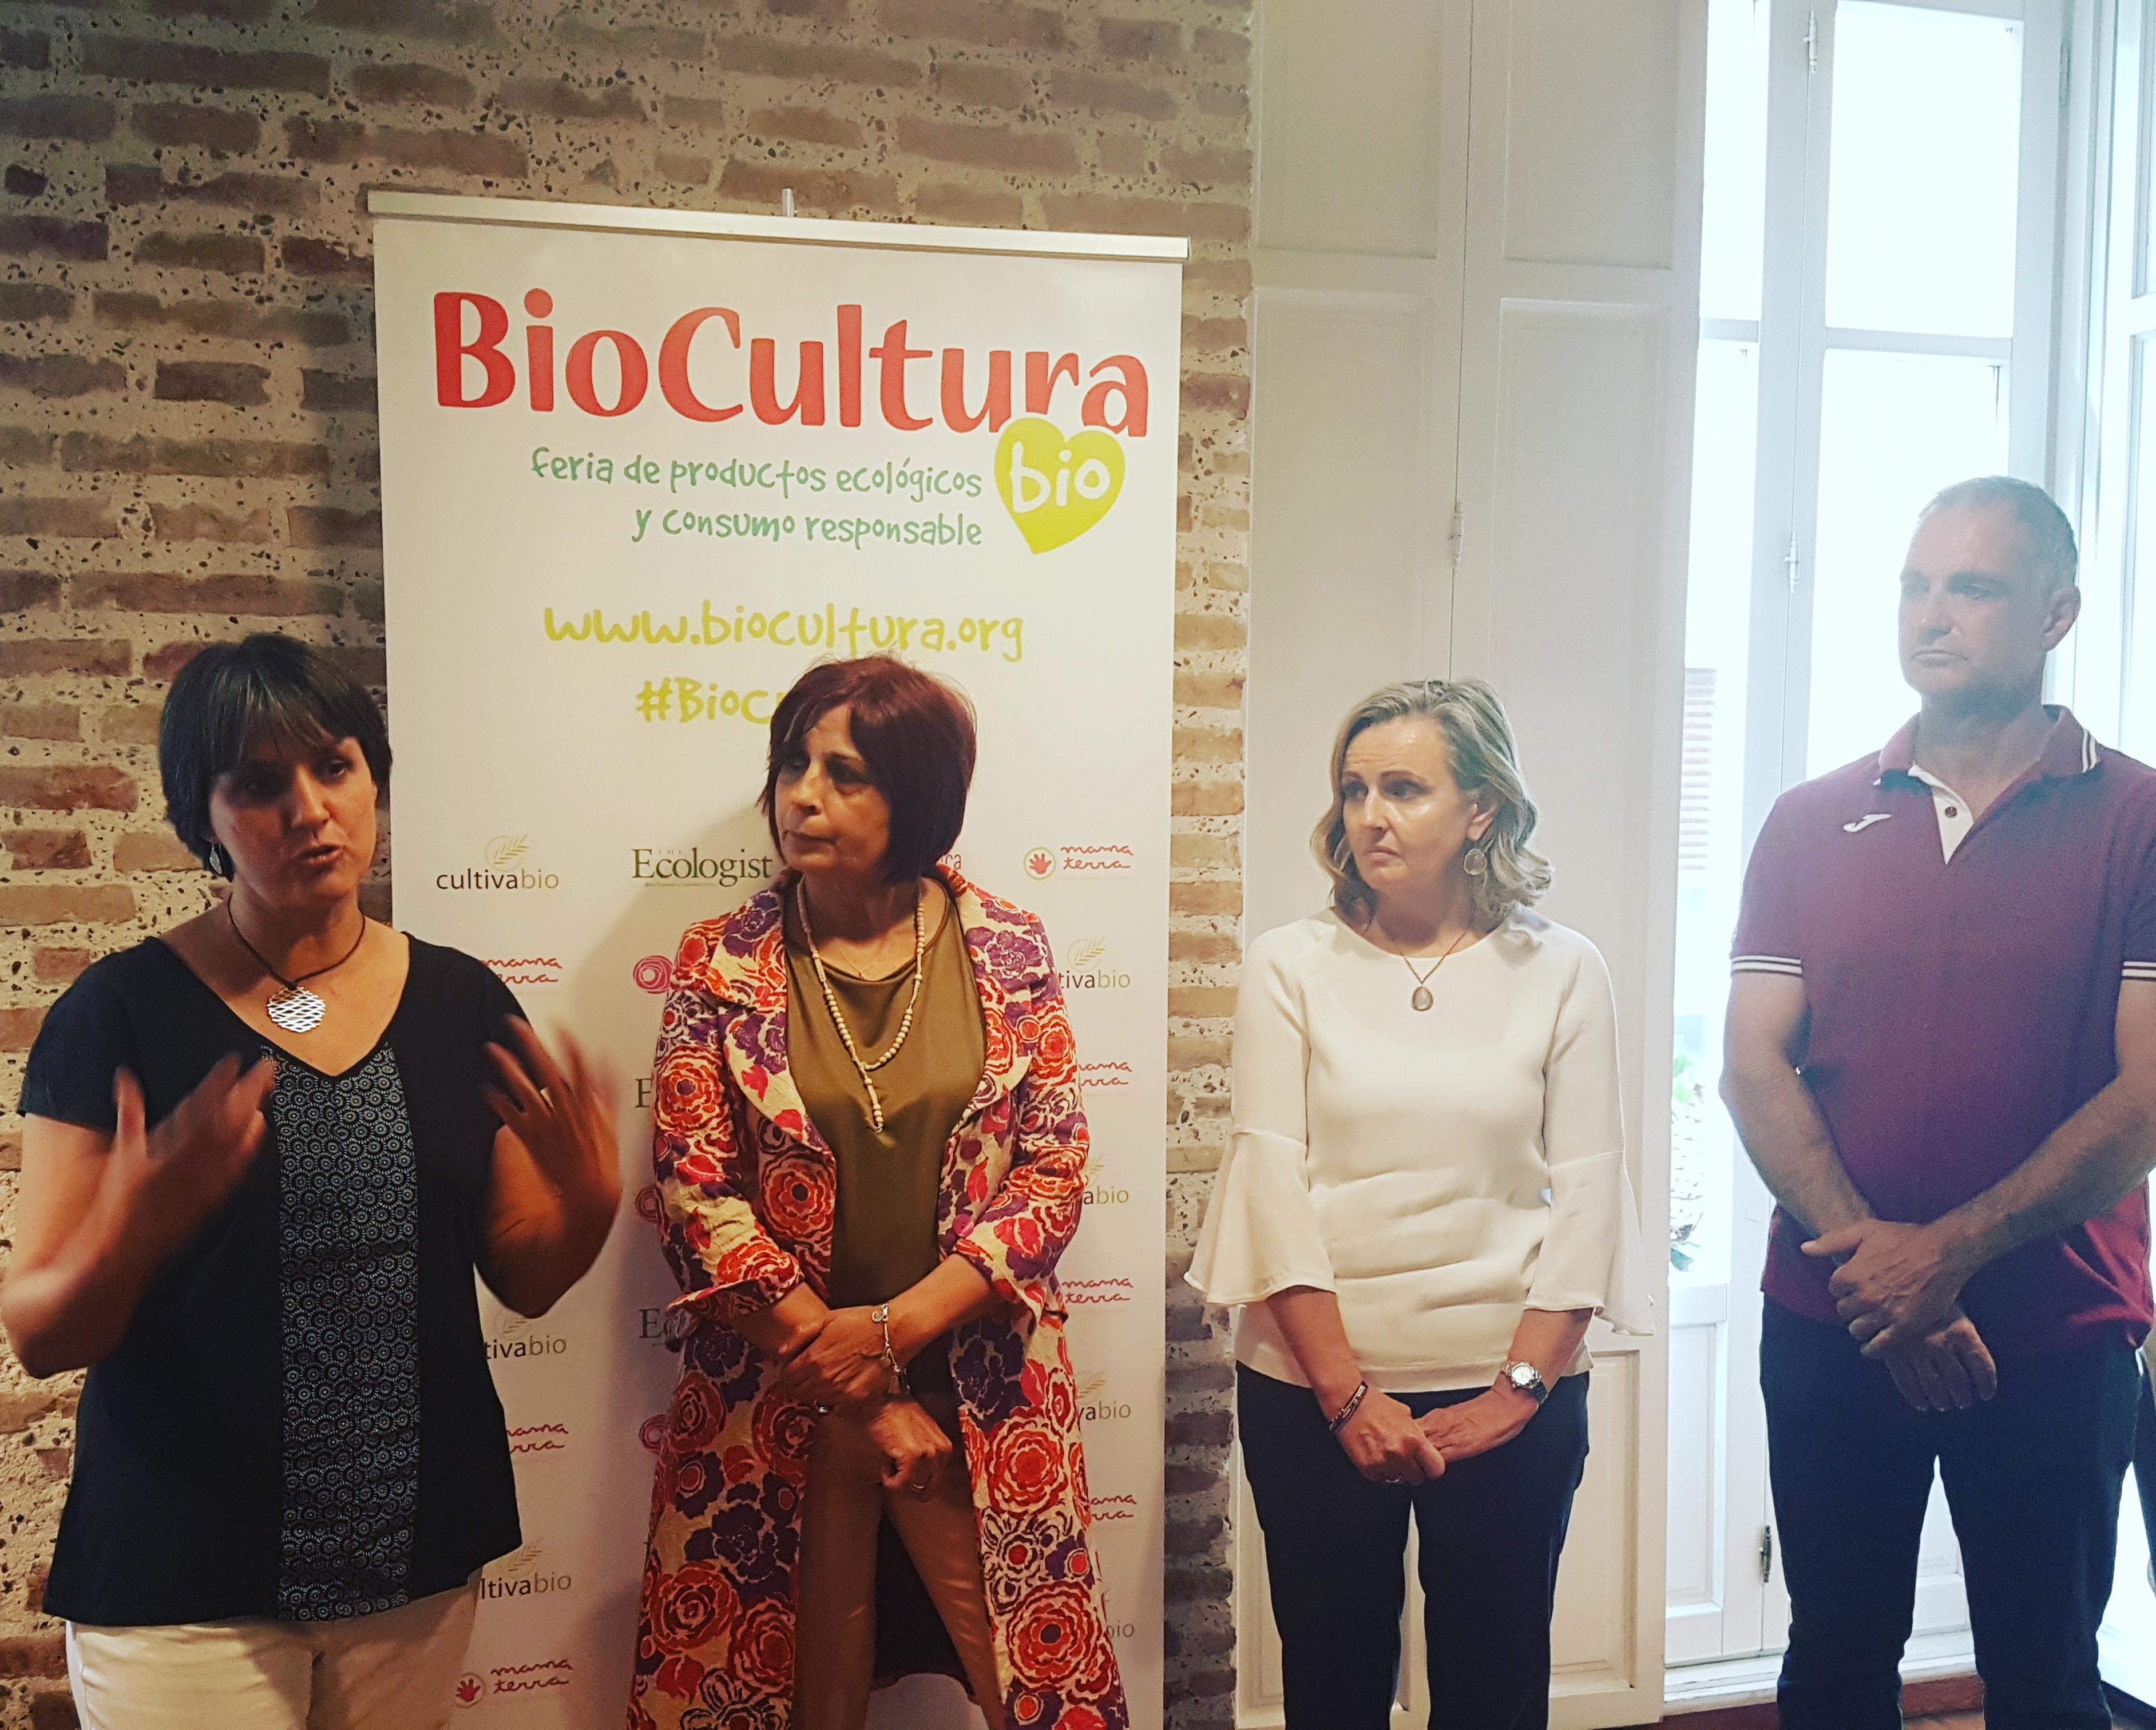 Rueda de prensa BioCultura Valencia 2017